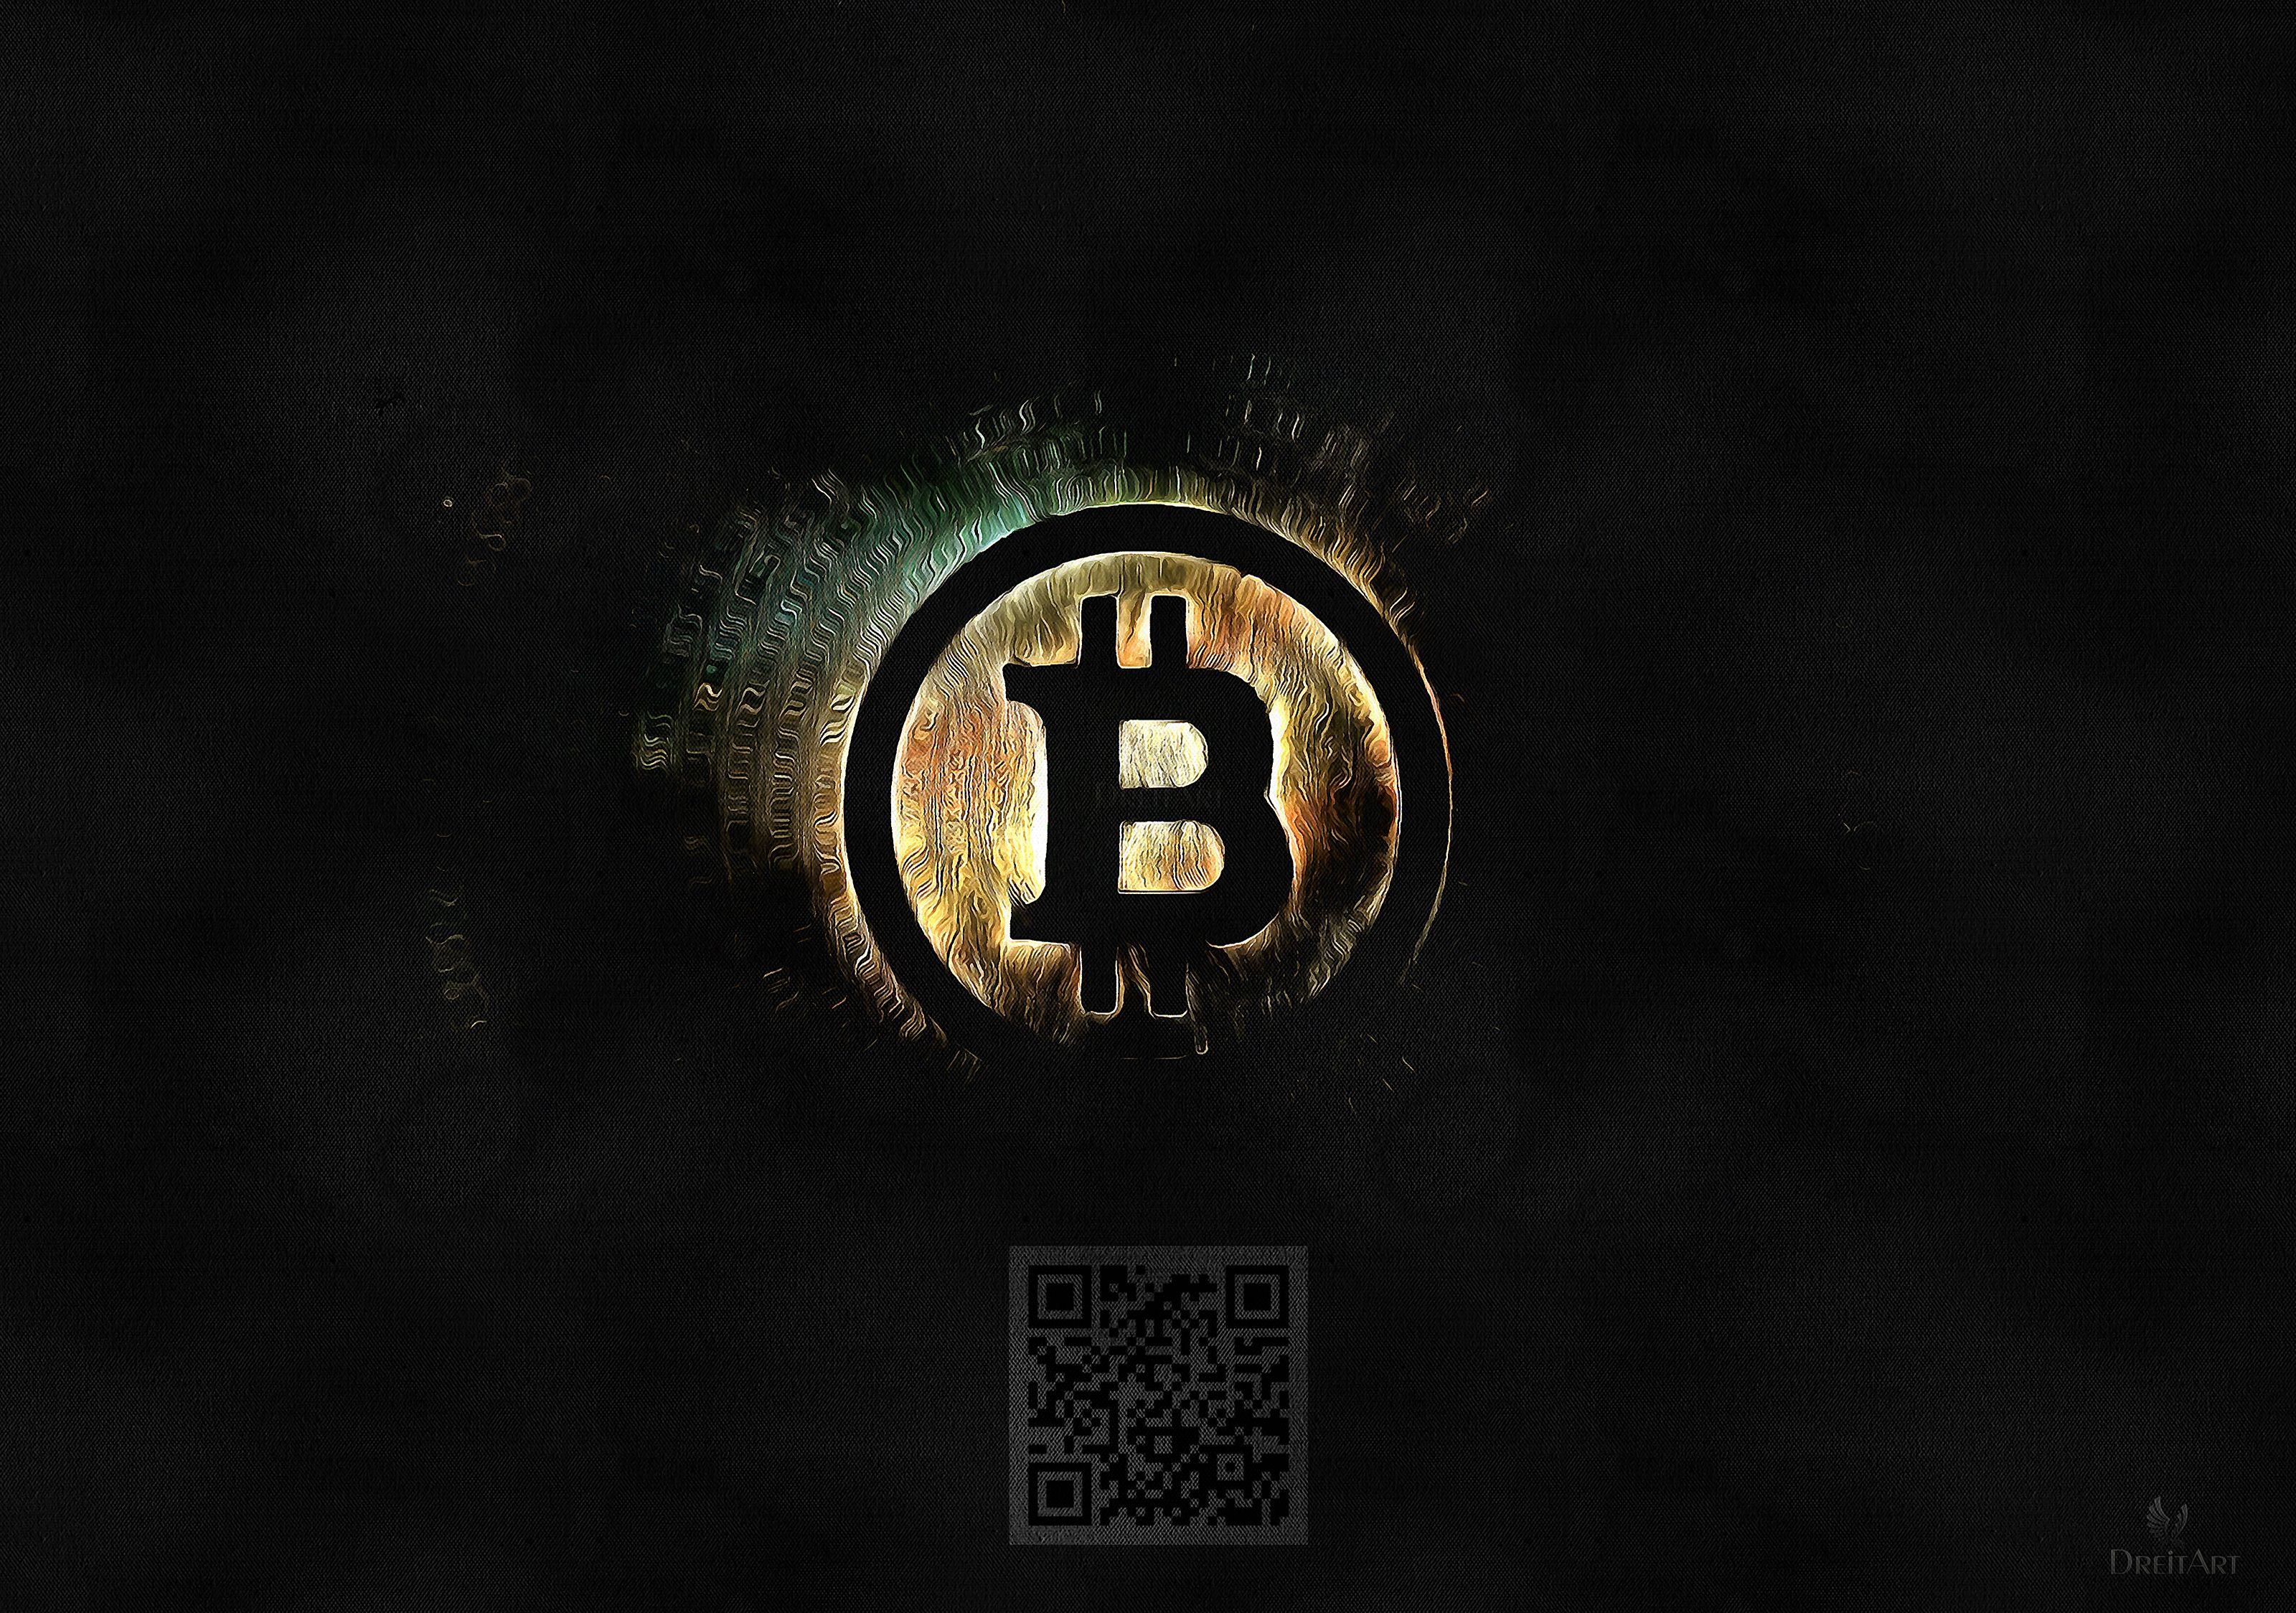 Bitcoin Dreitart Btc Crypto Cryptocurrency Abstract Wallpaper